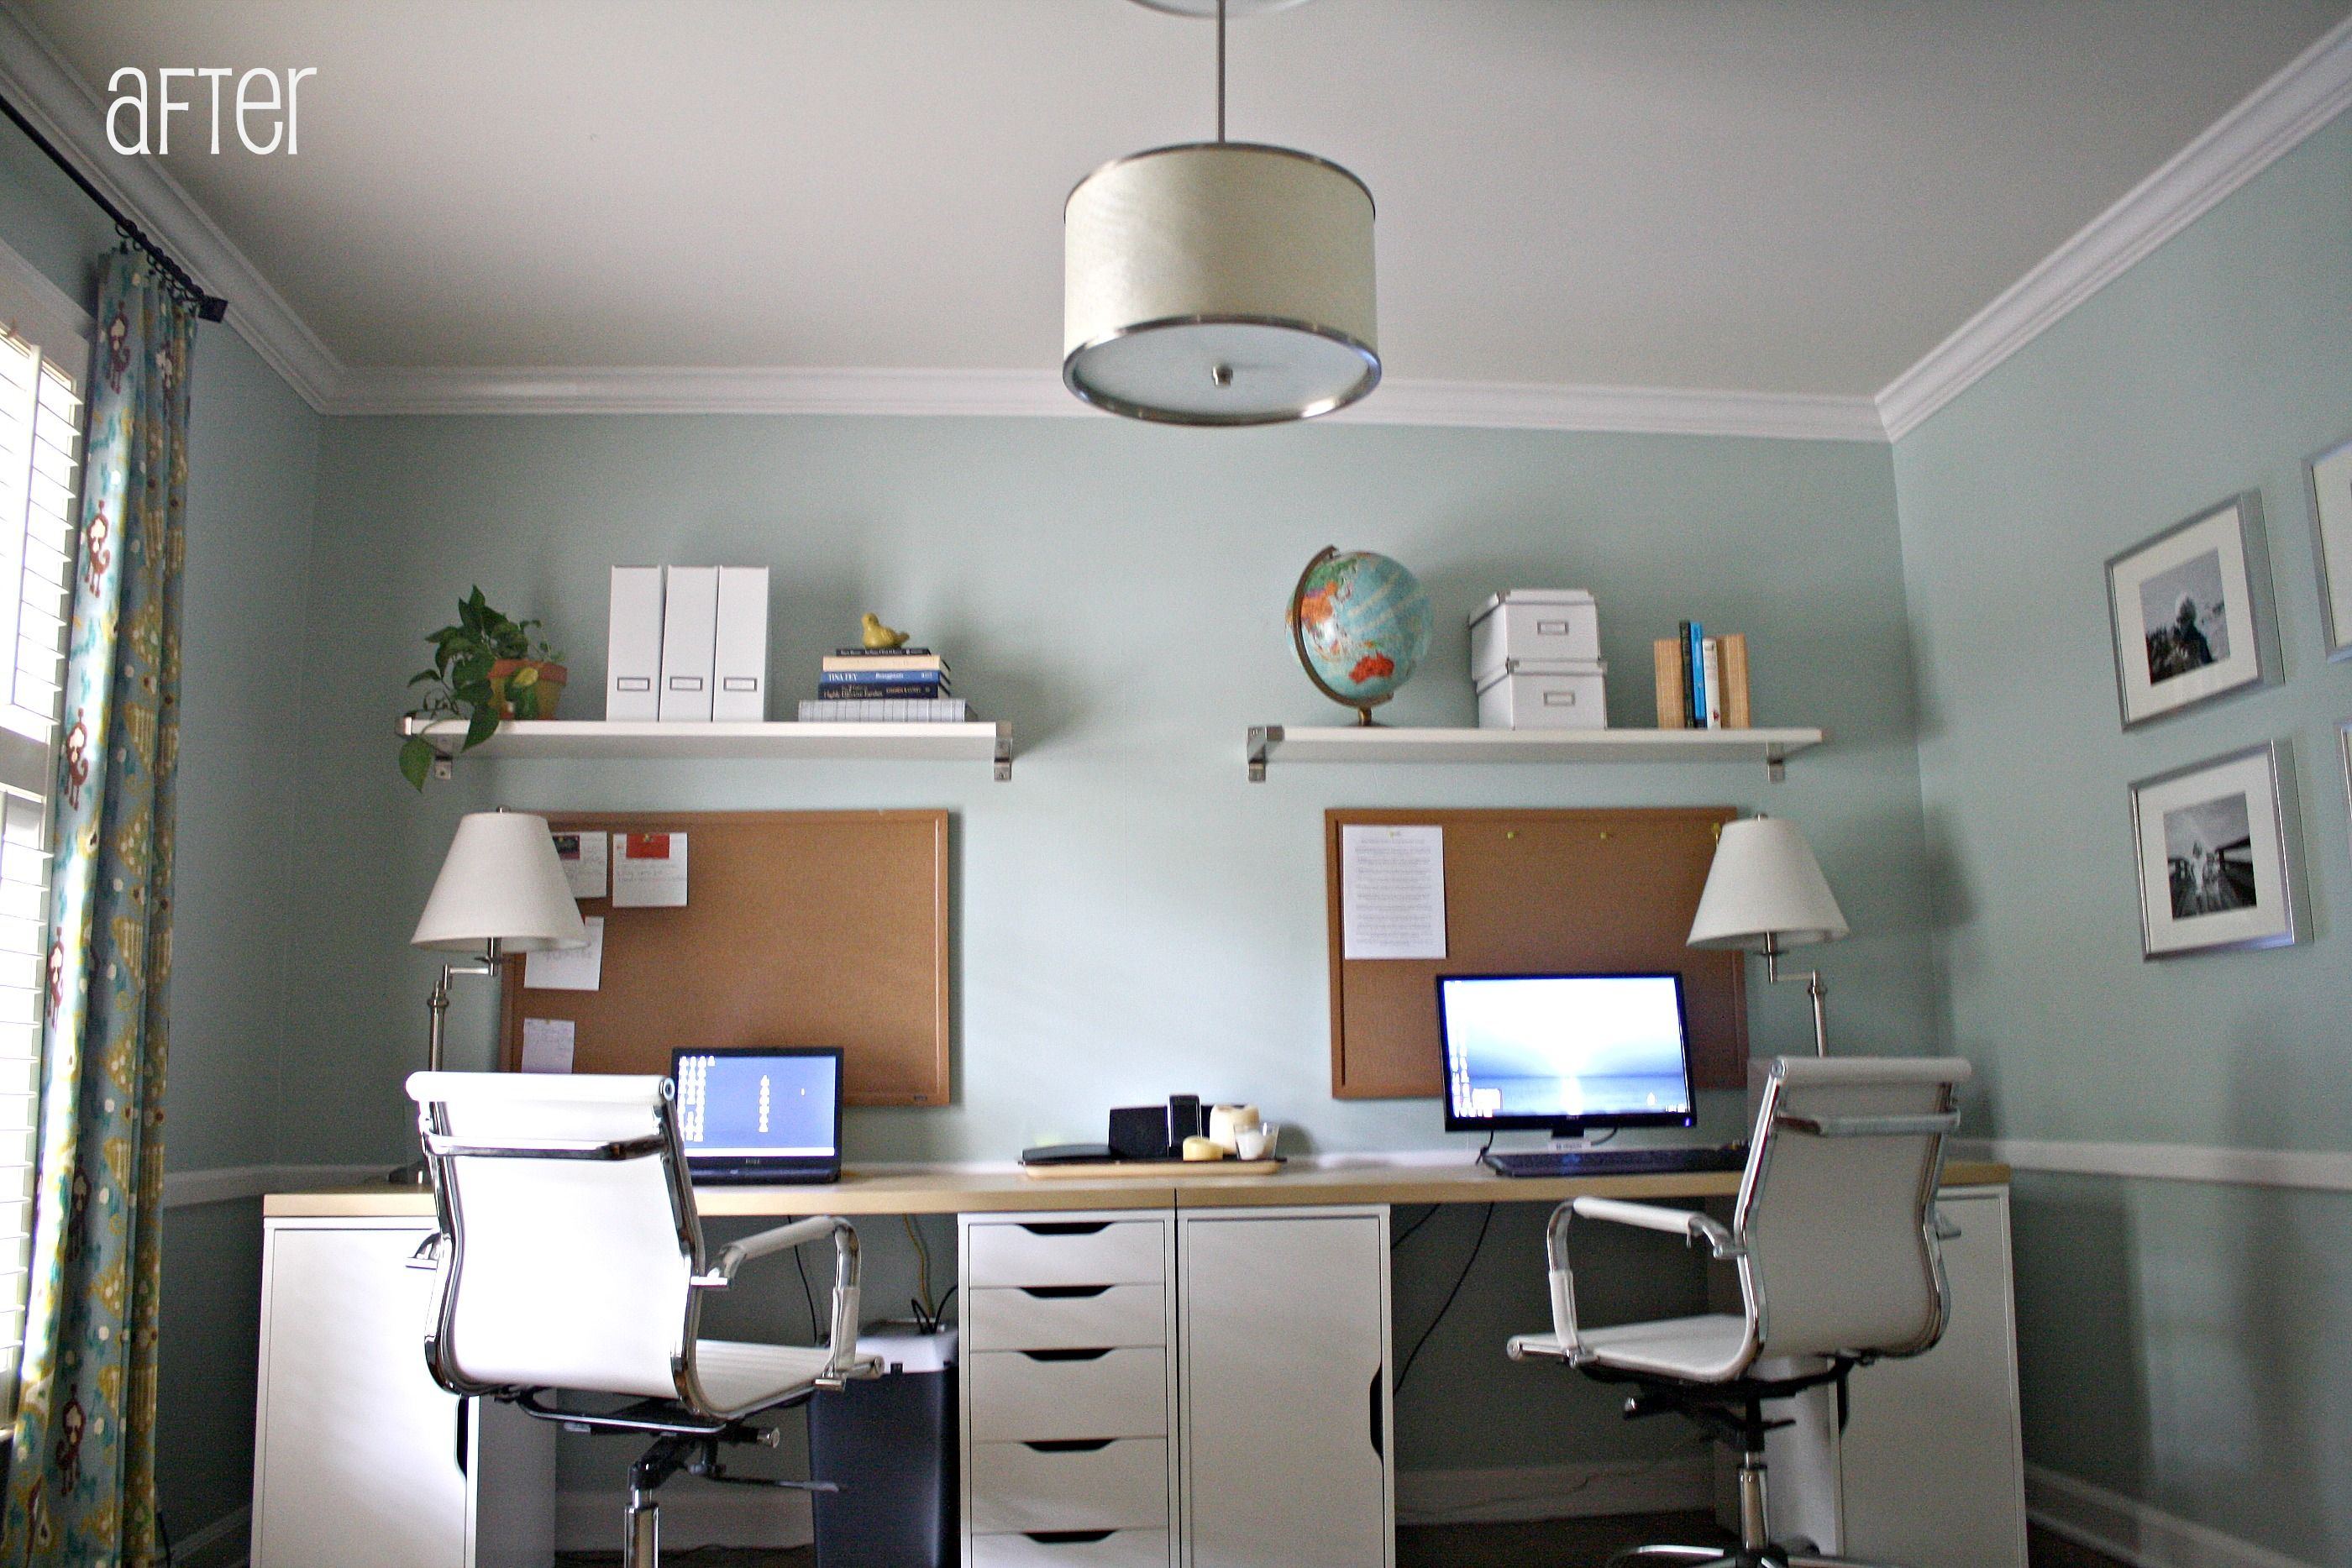 Arbeitszimmer für Zwei // Home Office for two | HOME Büro // Office ...